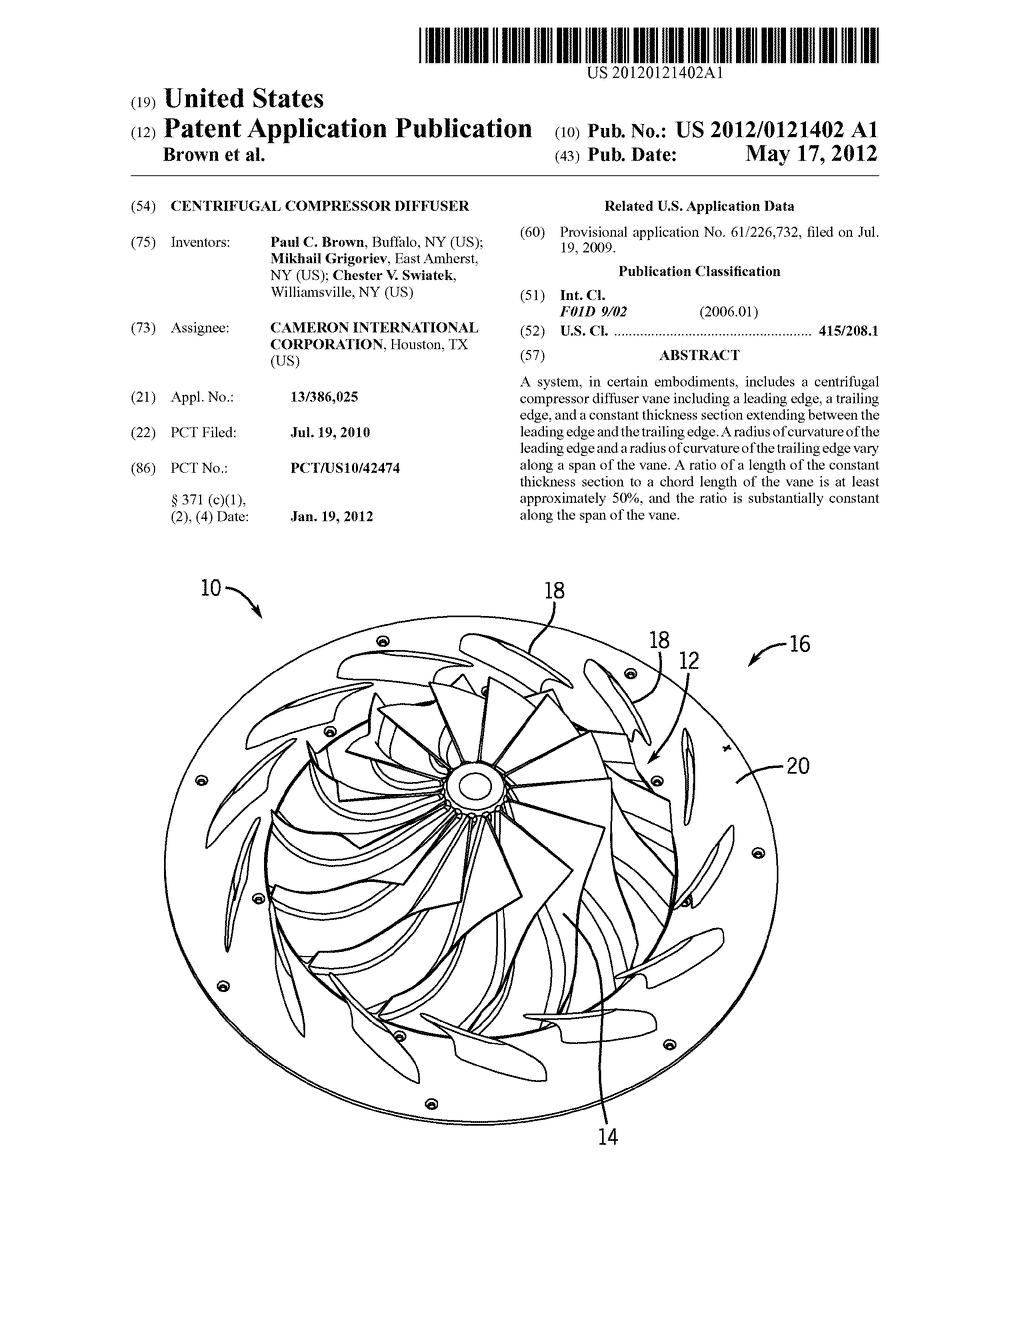 Centrifugal Blower Diagram : Centrifugal diagram images fan